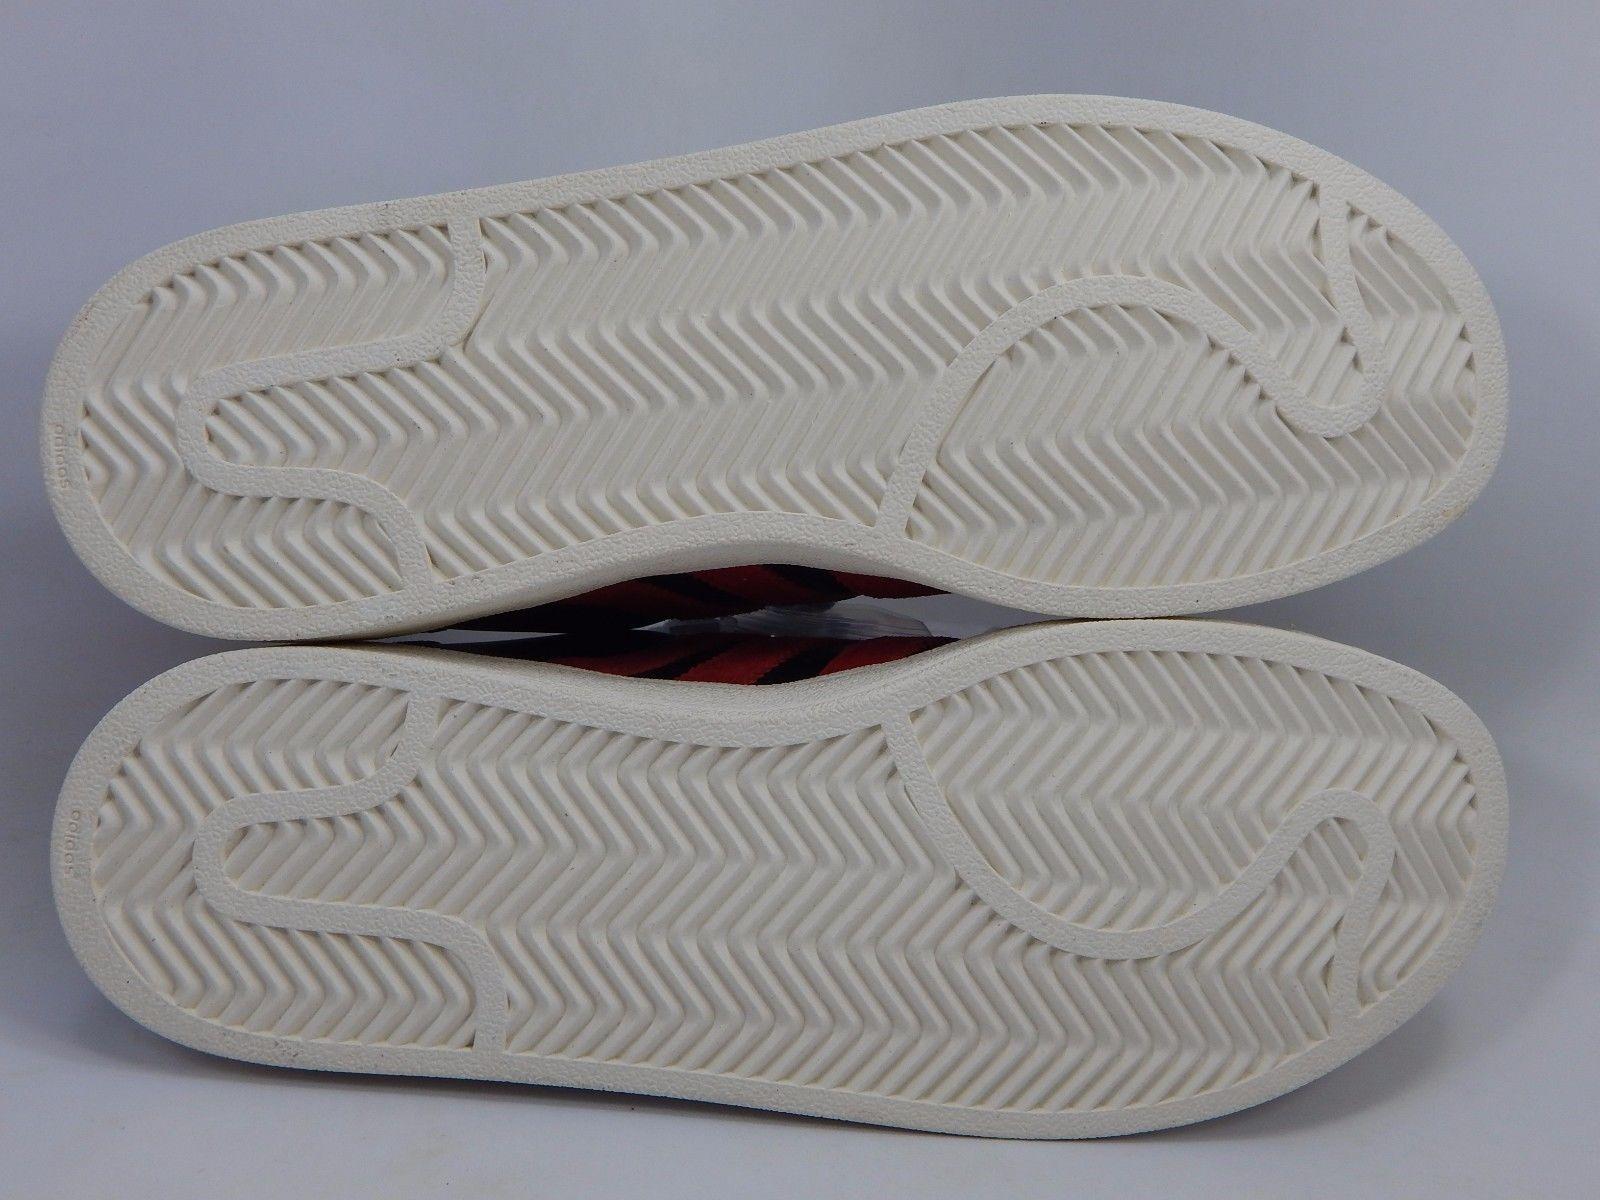 Adidas Superstar Big Kid's Girl's Youth Shoes Sz US 6.5 Y EU 39 1/3 Black D74444